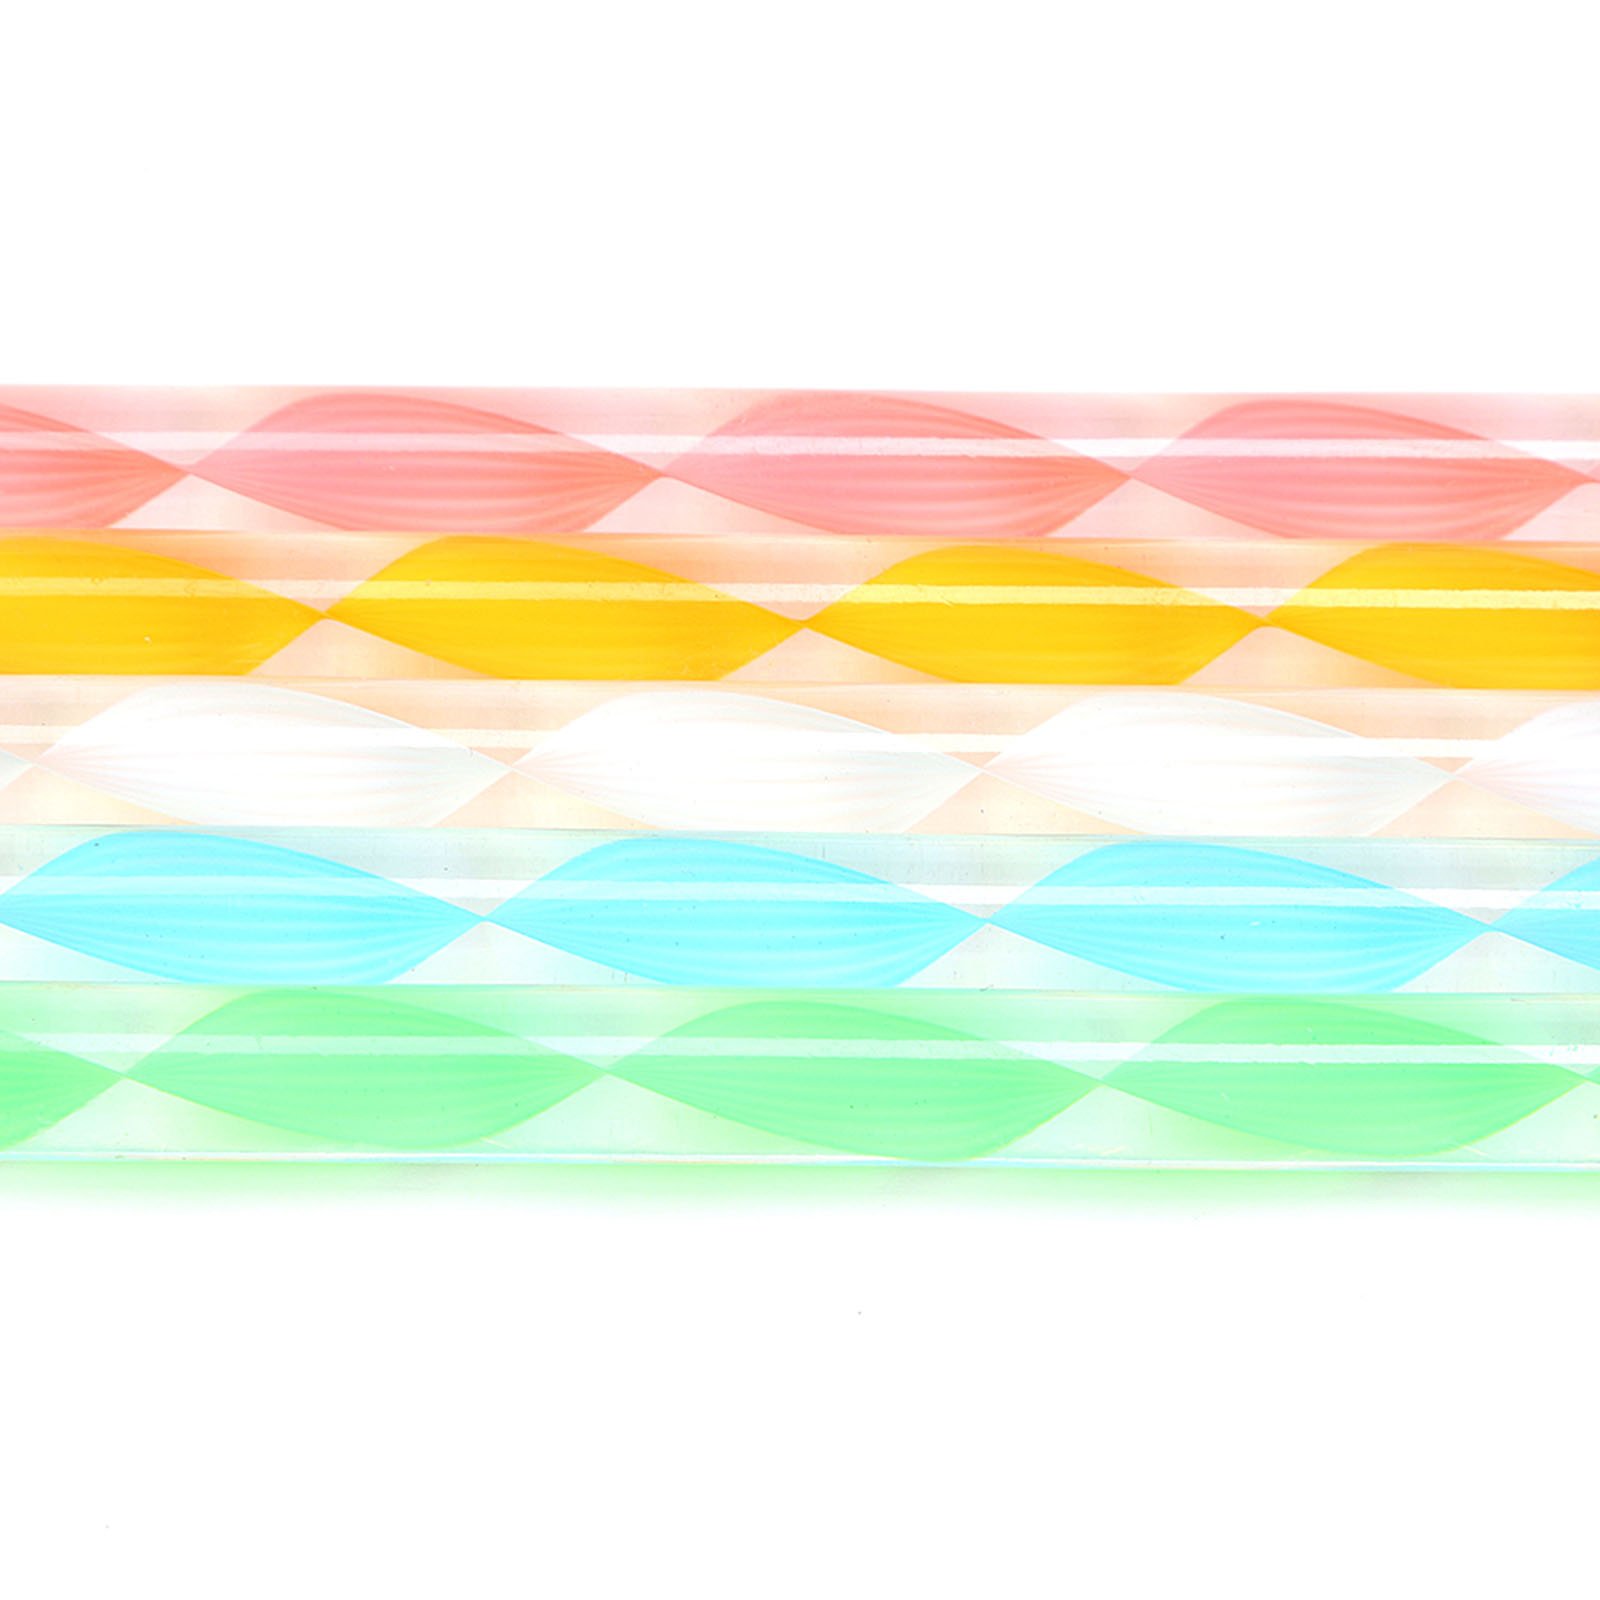 5X2Ways Nail Art Dotting Pens Acrylic Brush Pen Set Advanced Tech Fast Delivery 4